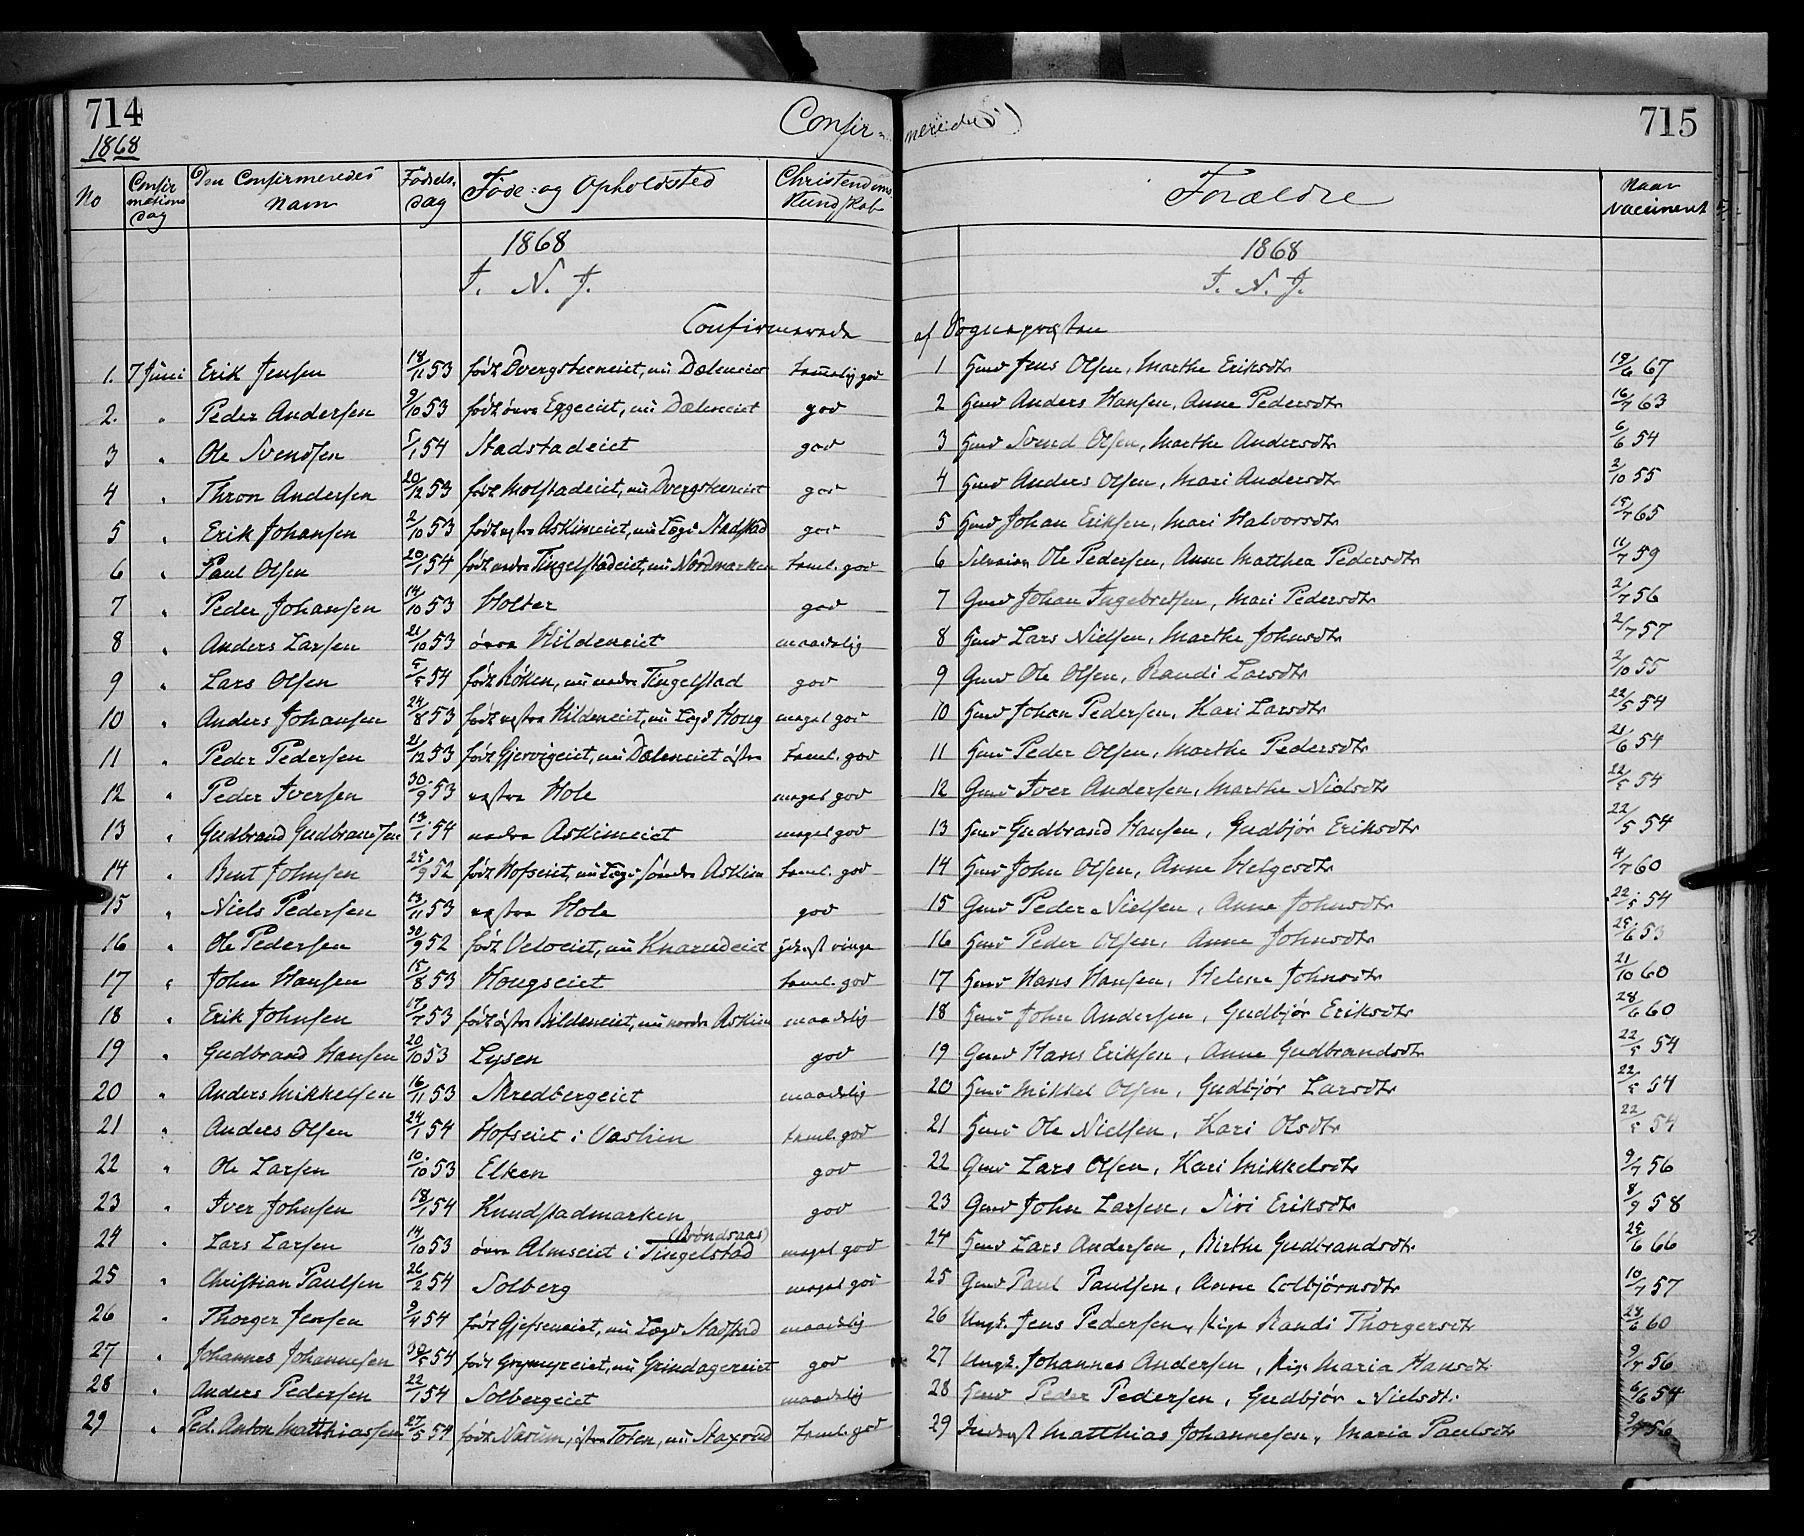 SAH, Gran prestekontor, Ministerialbok nr. 12, 1856-1874, s. 714-715